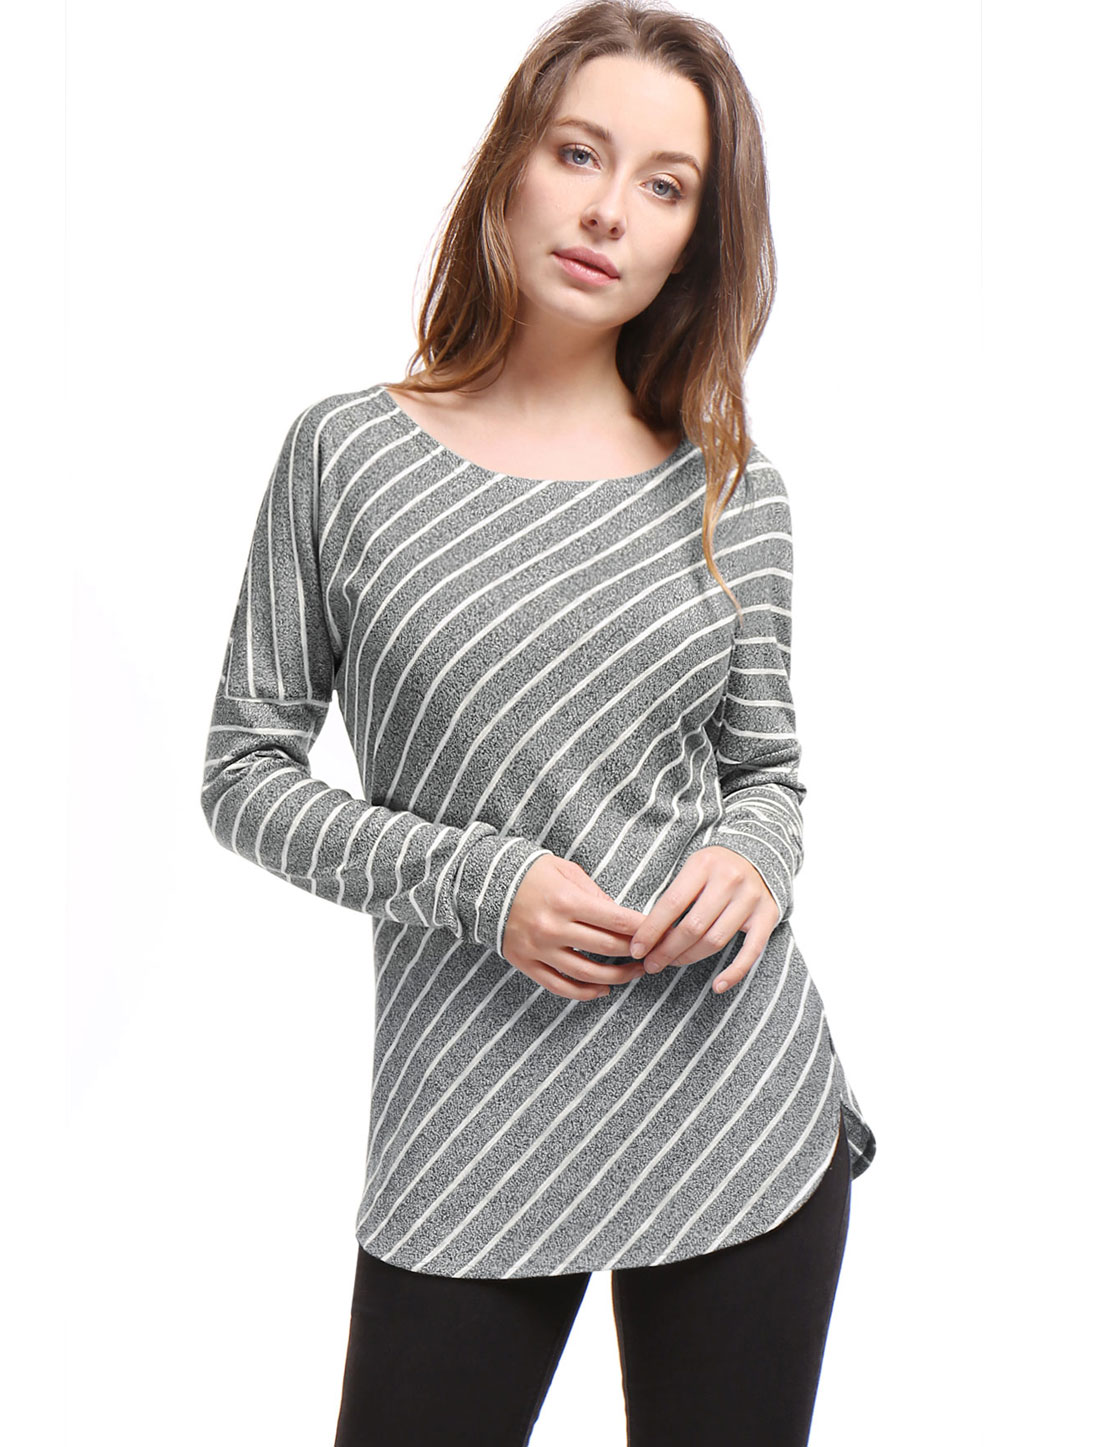 Women Stripes Scoop Neck Long Drop Sleeves Top Gray XS